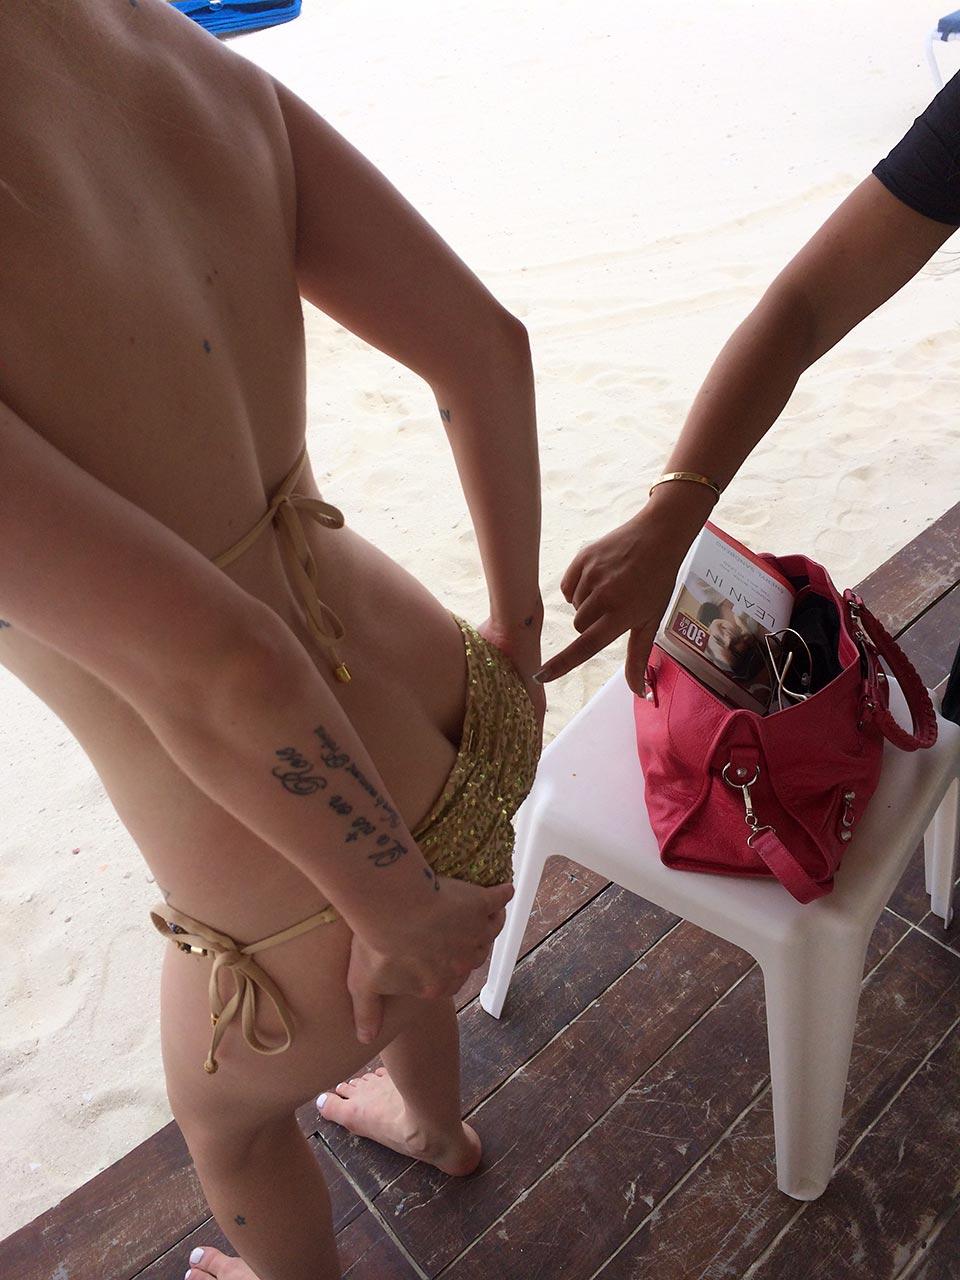 Avril lavigne nudes leaked Icloud